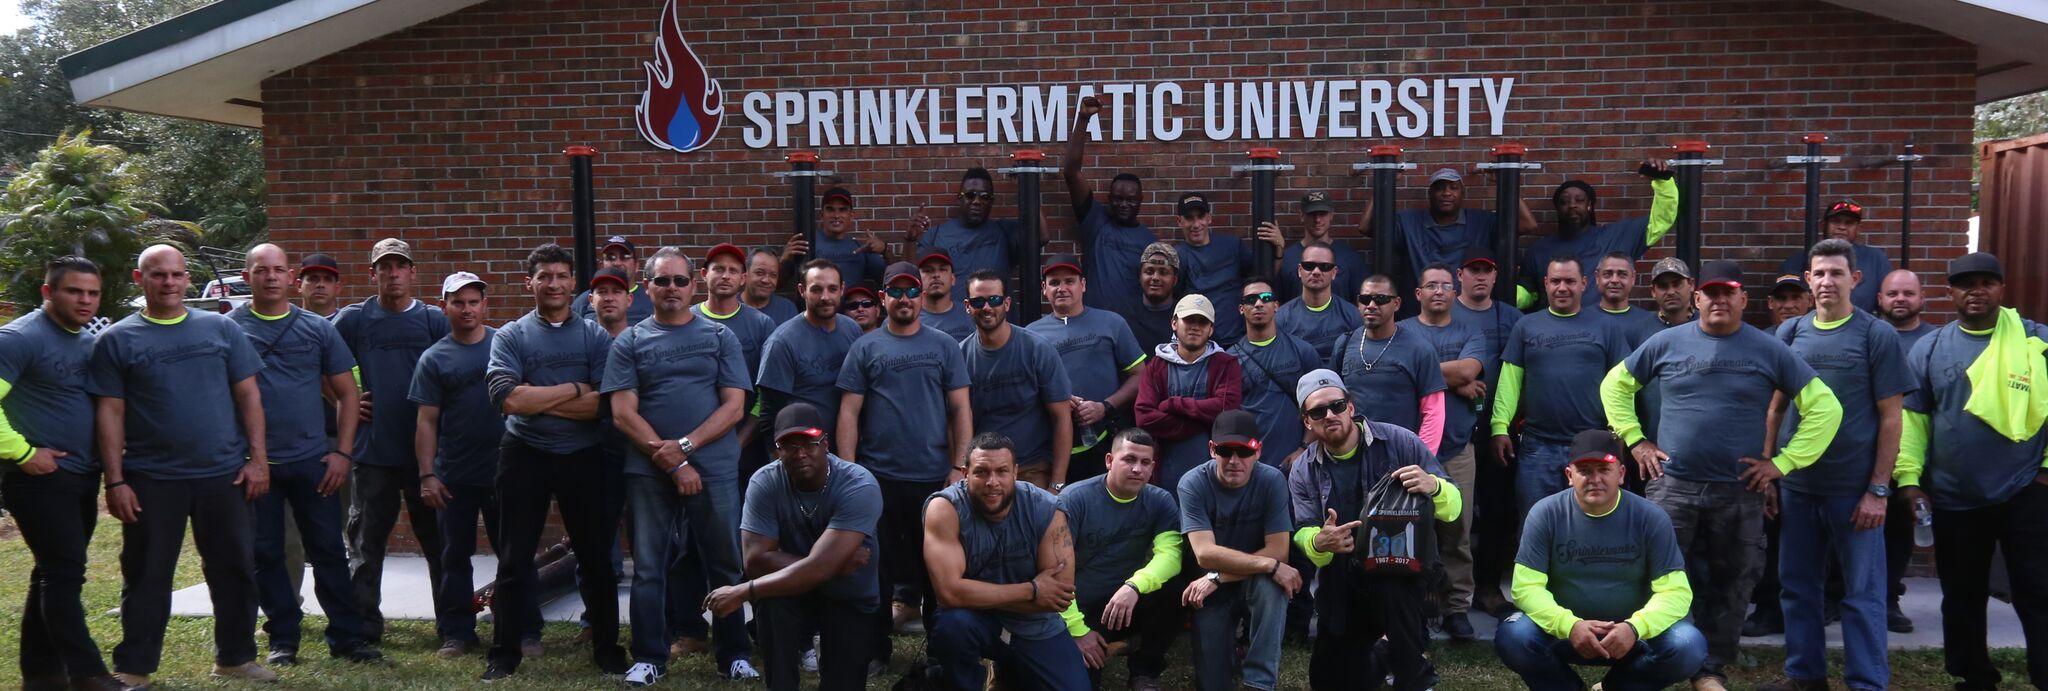 sprinklermatic university fire protection